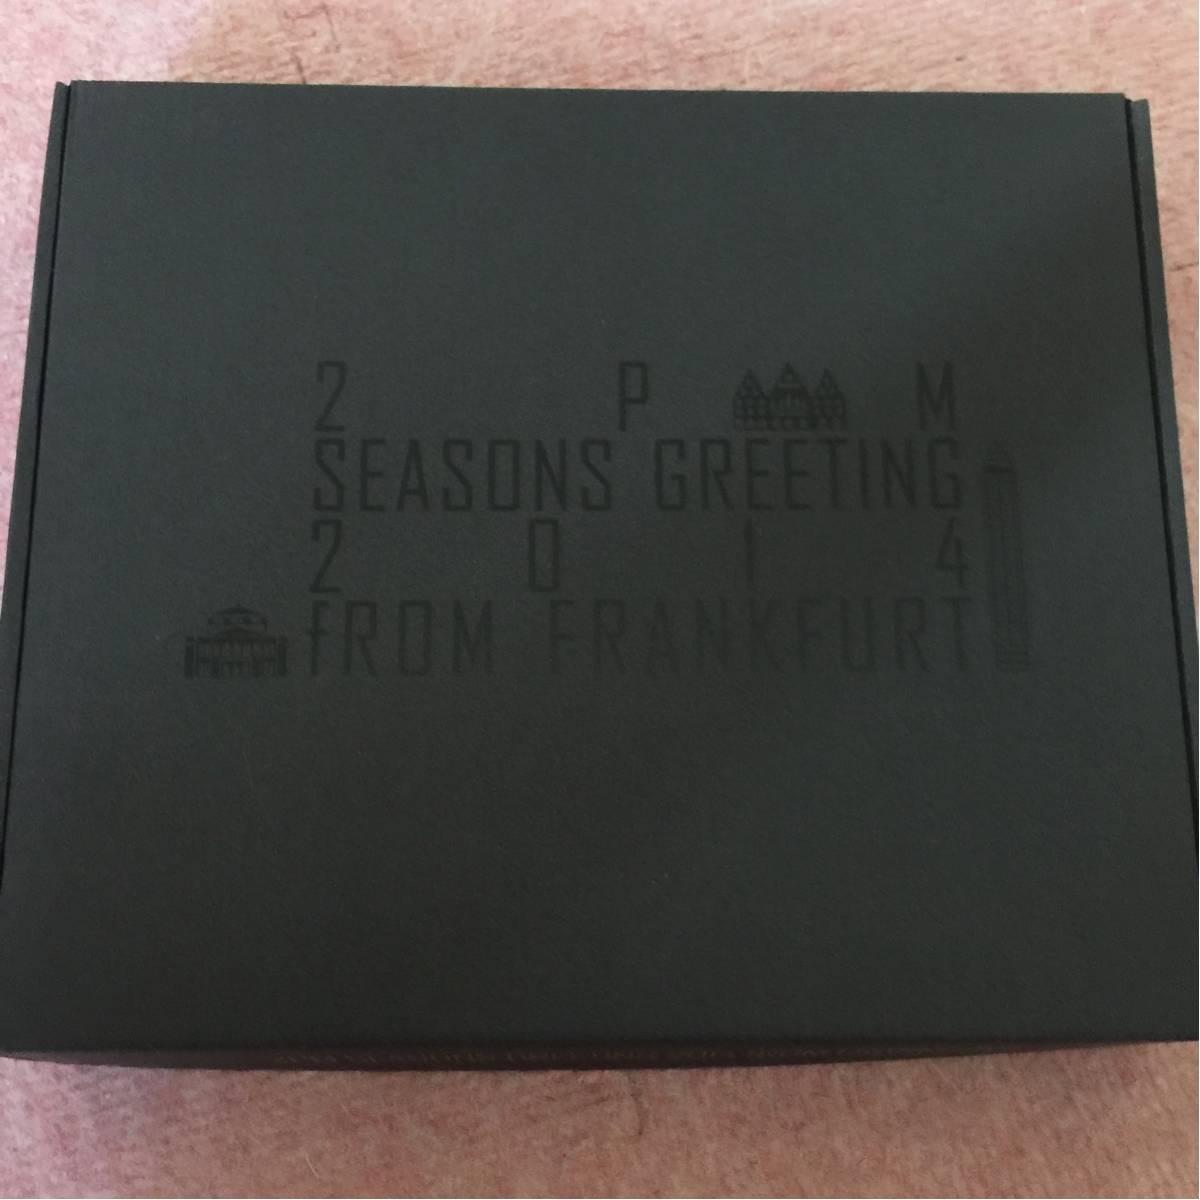 2PM Hottest限定 seasons Greeting 2014